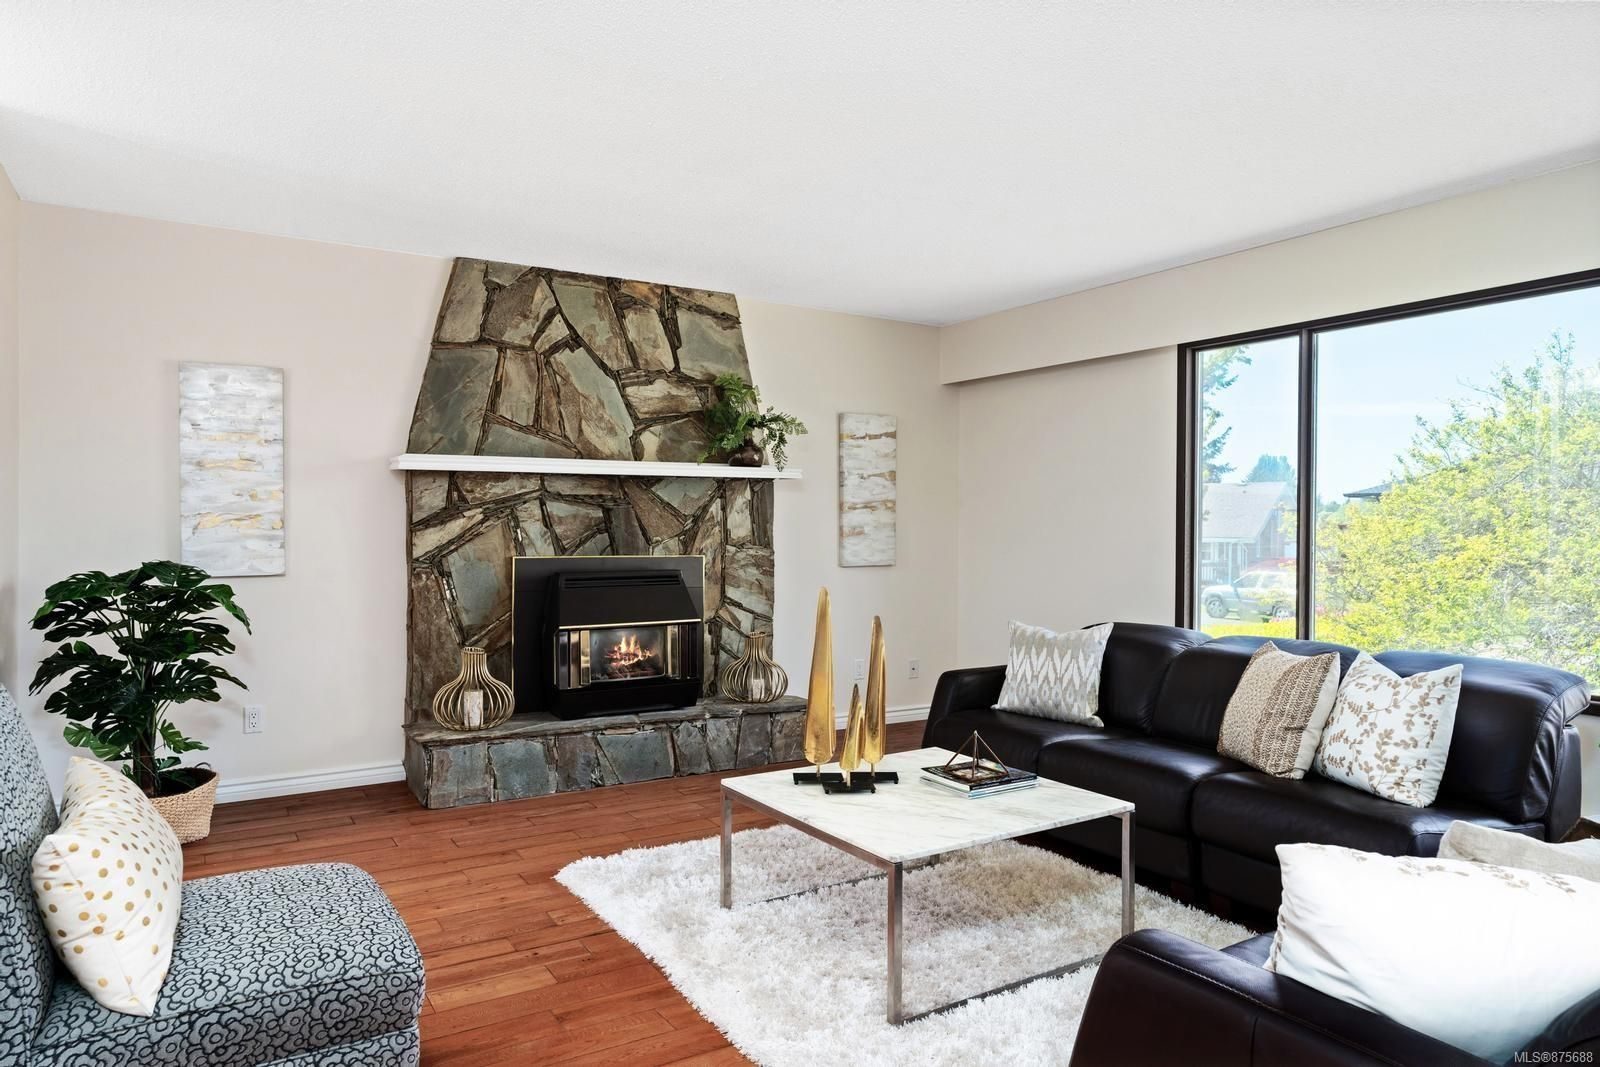 Main Photo: 4341 San Cristo Pl in : SE Gordon Head House for sale (Saanich East)  : MLS®# 875688